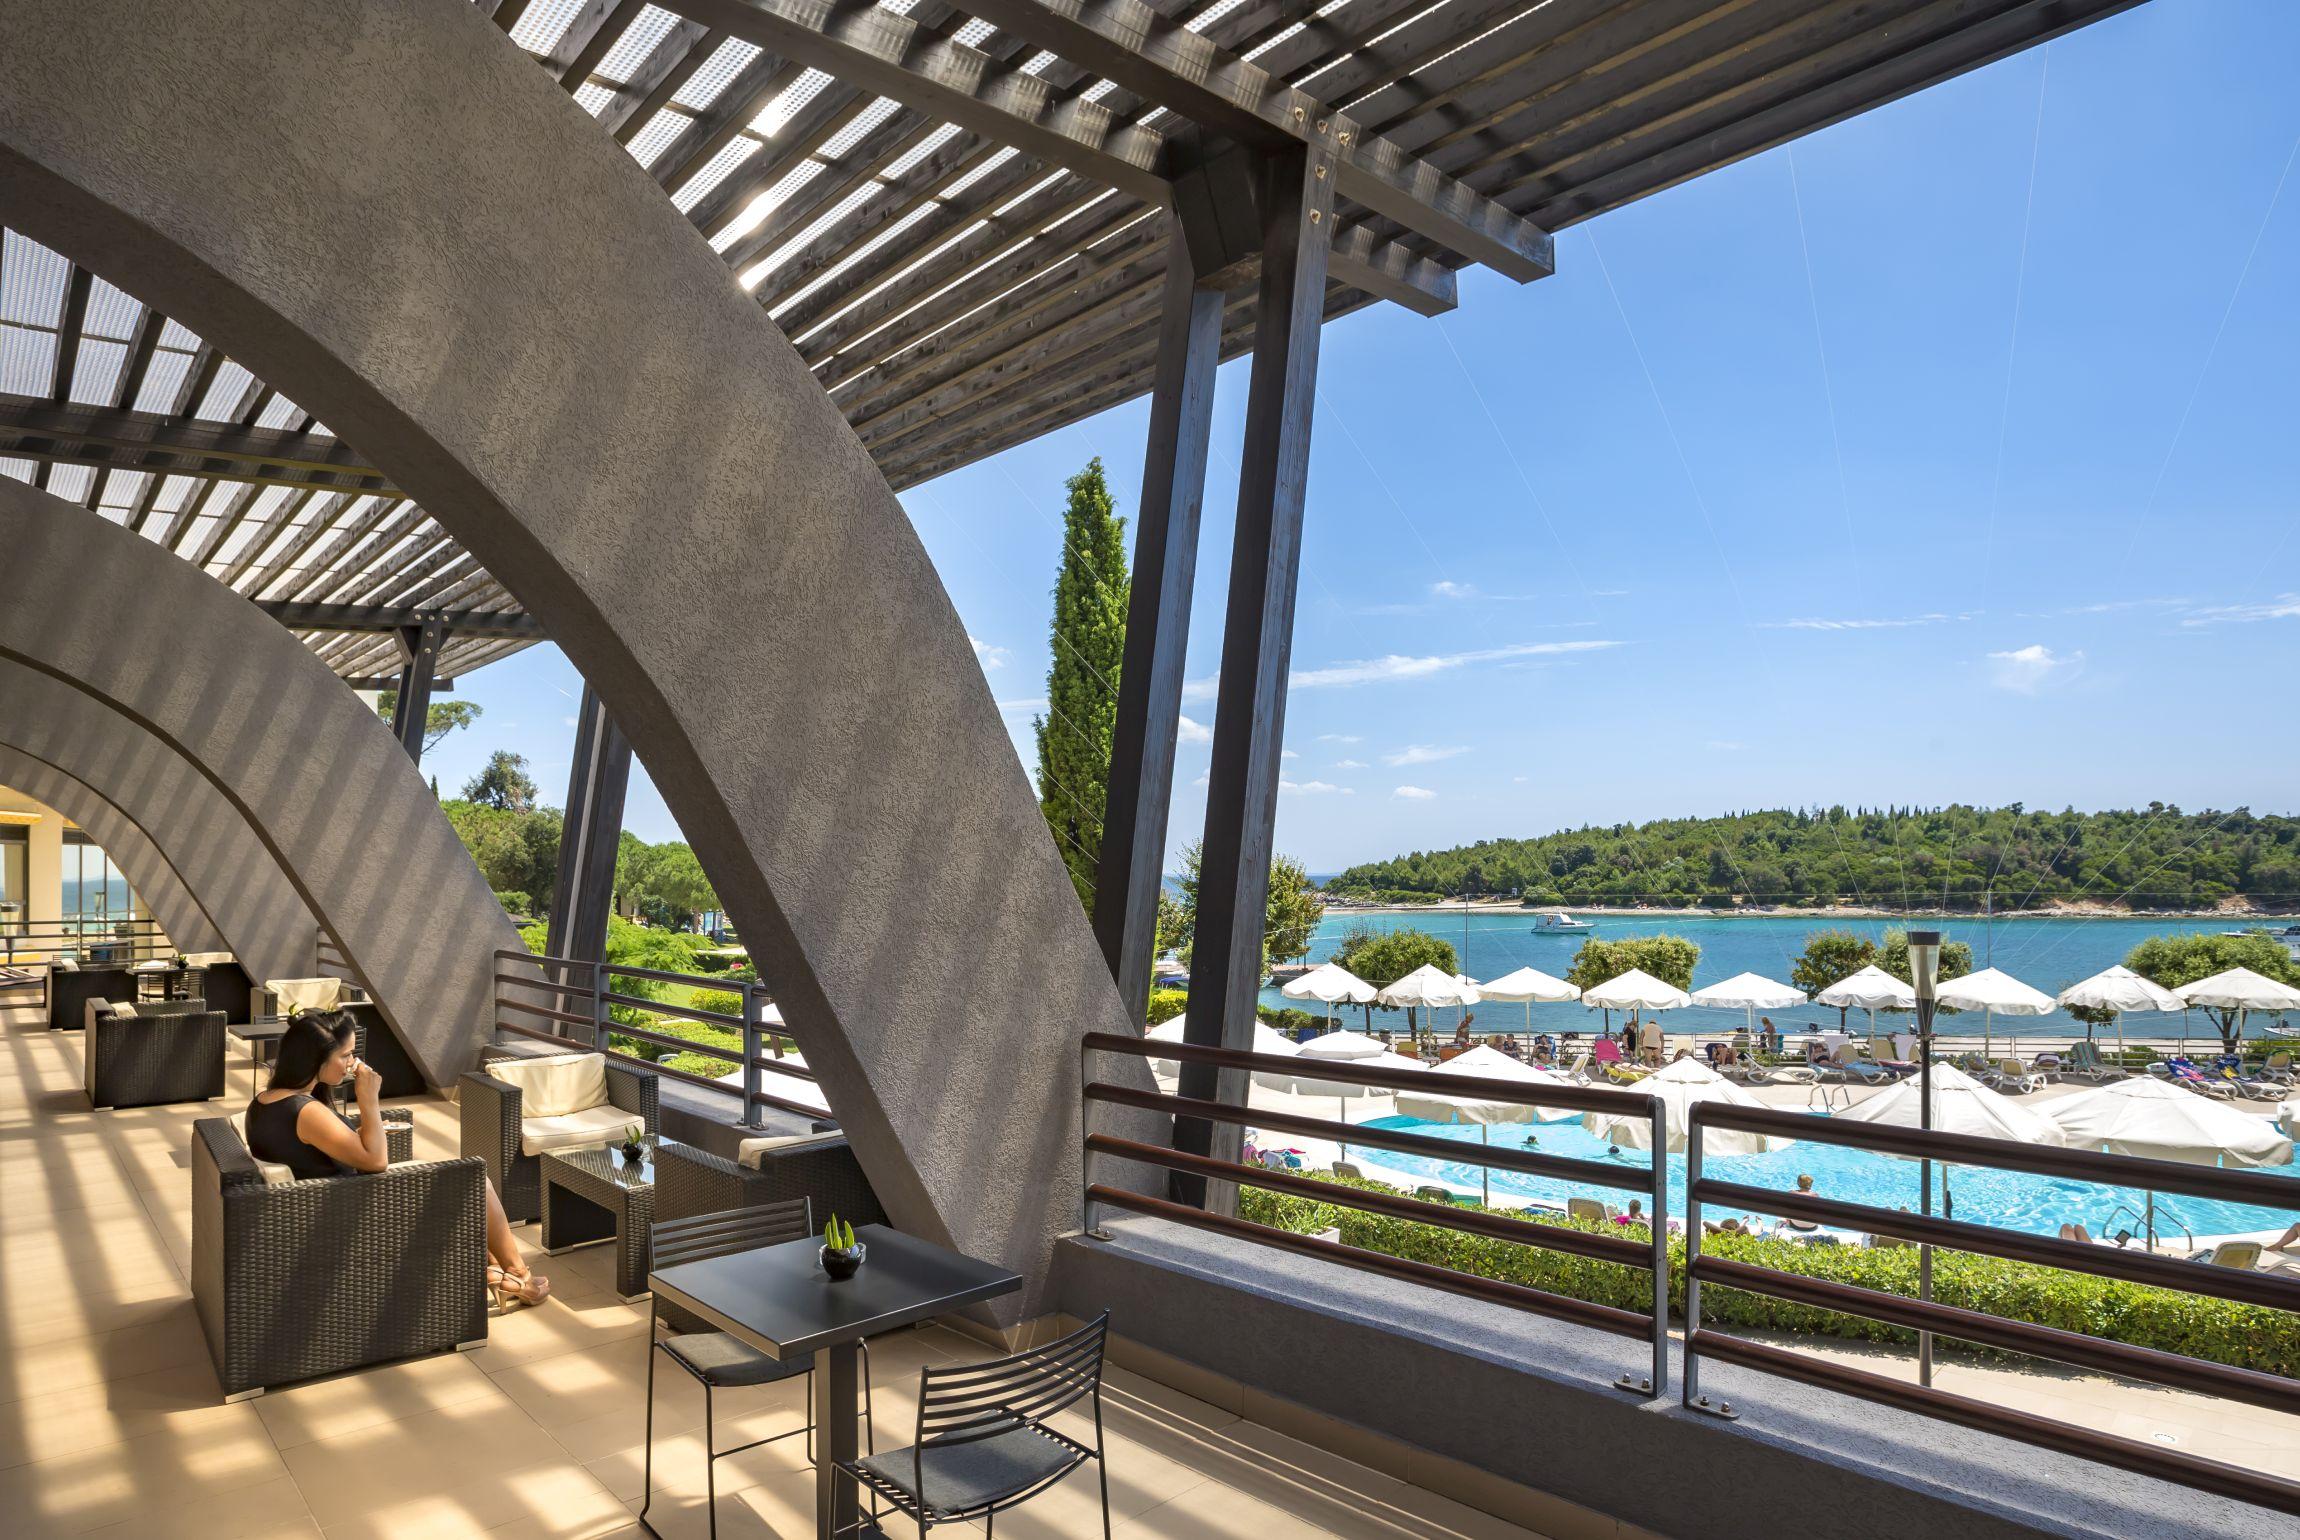 Hotel Istra (9)